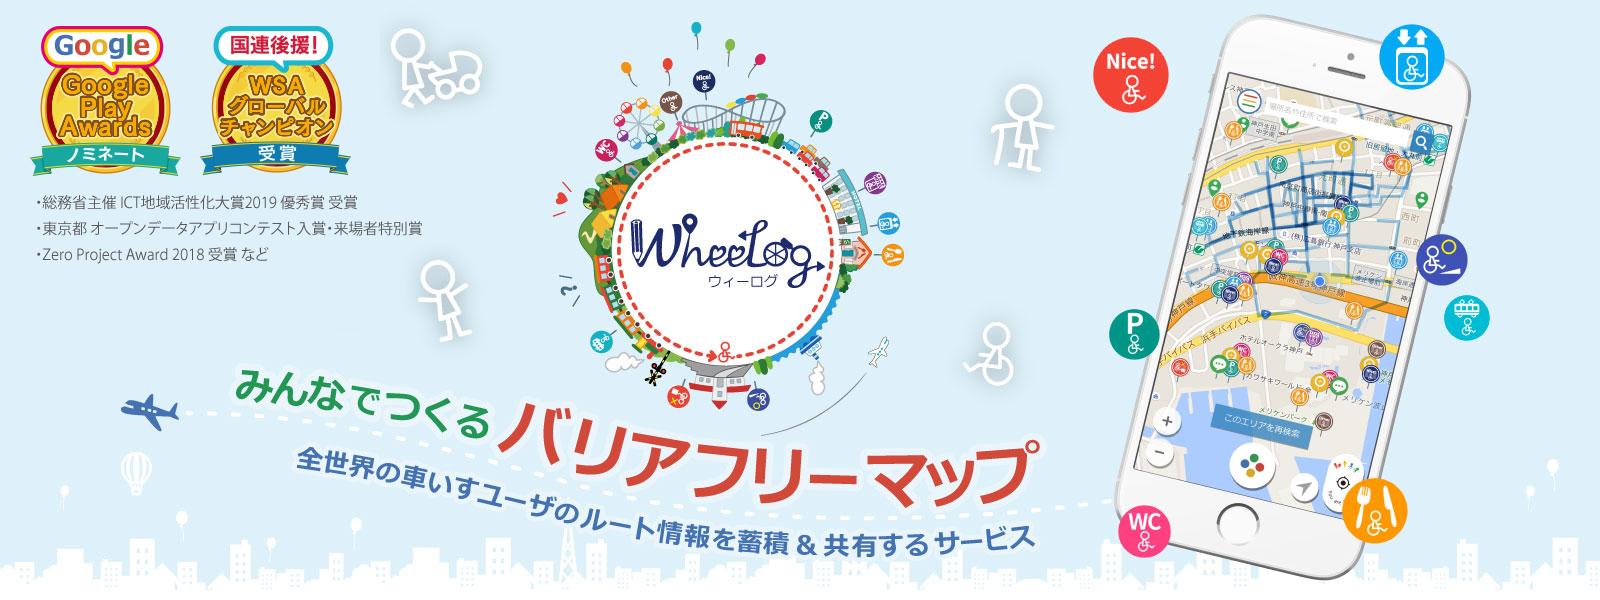 WheeLog! 「お店投稿」をしたり「走行ログ」をシェアして、バリアフリーな車いすマップをみんなで作ろう!